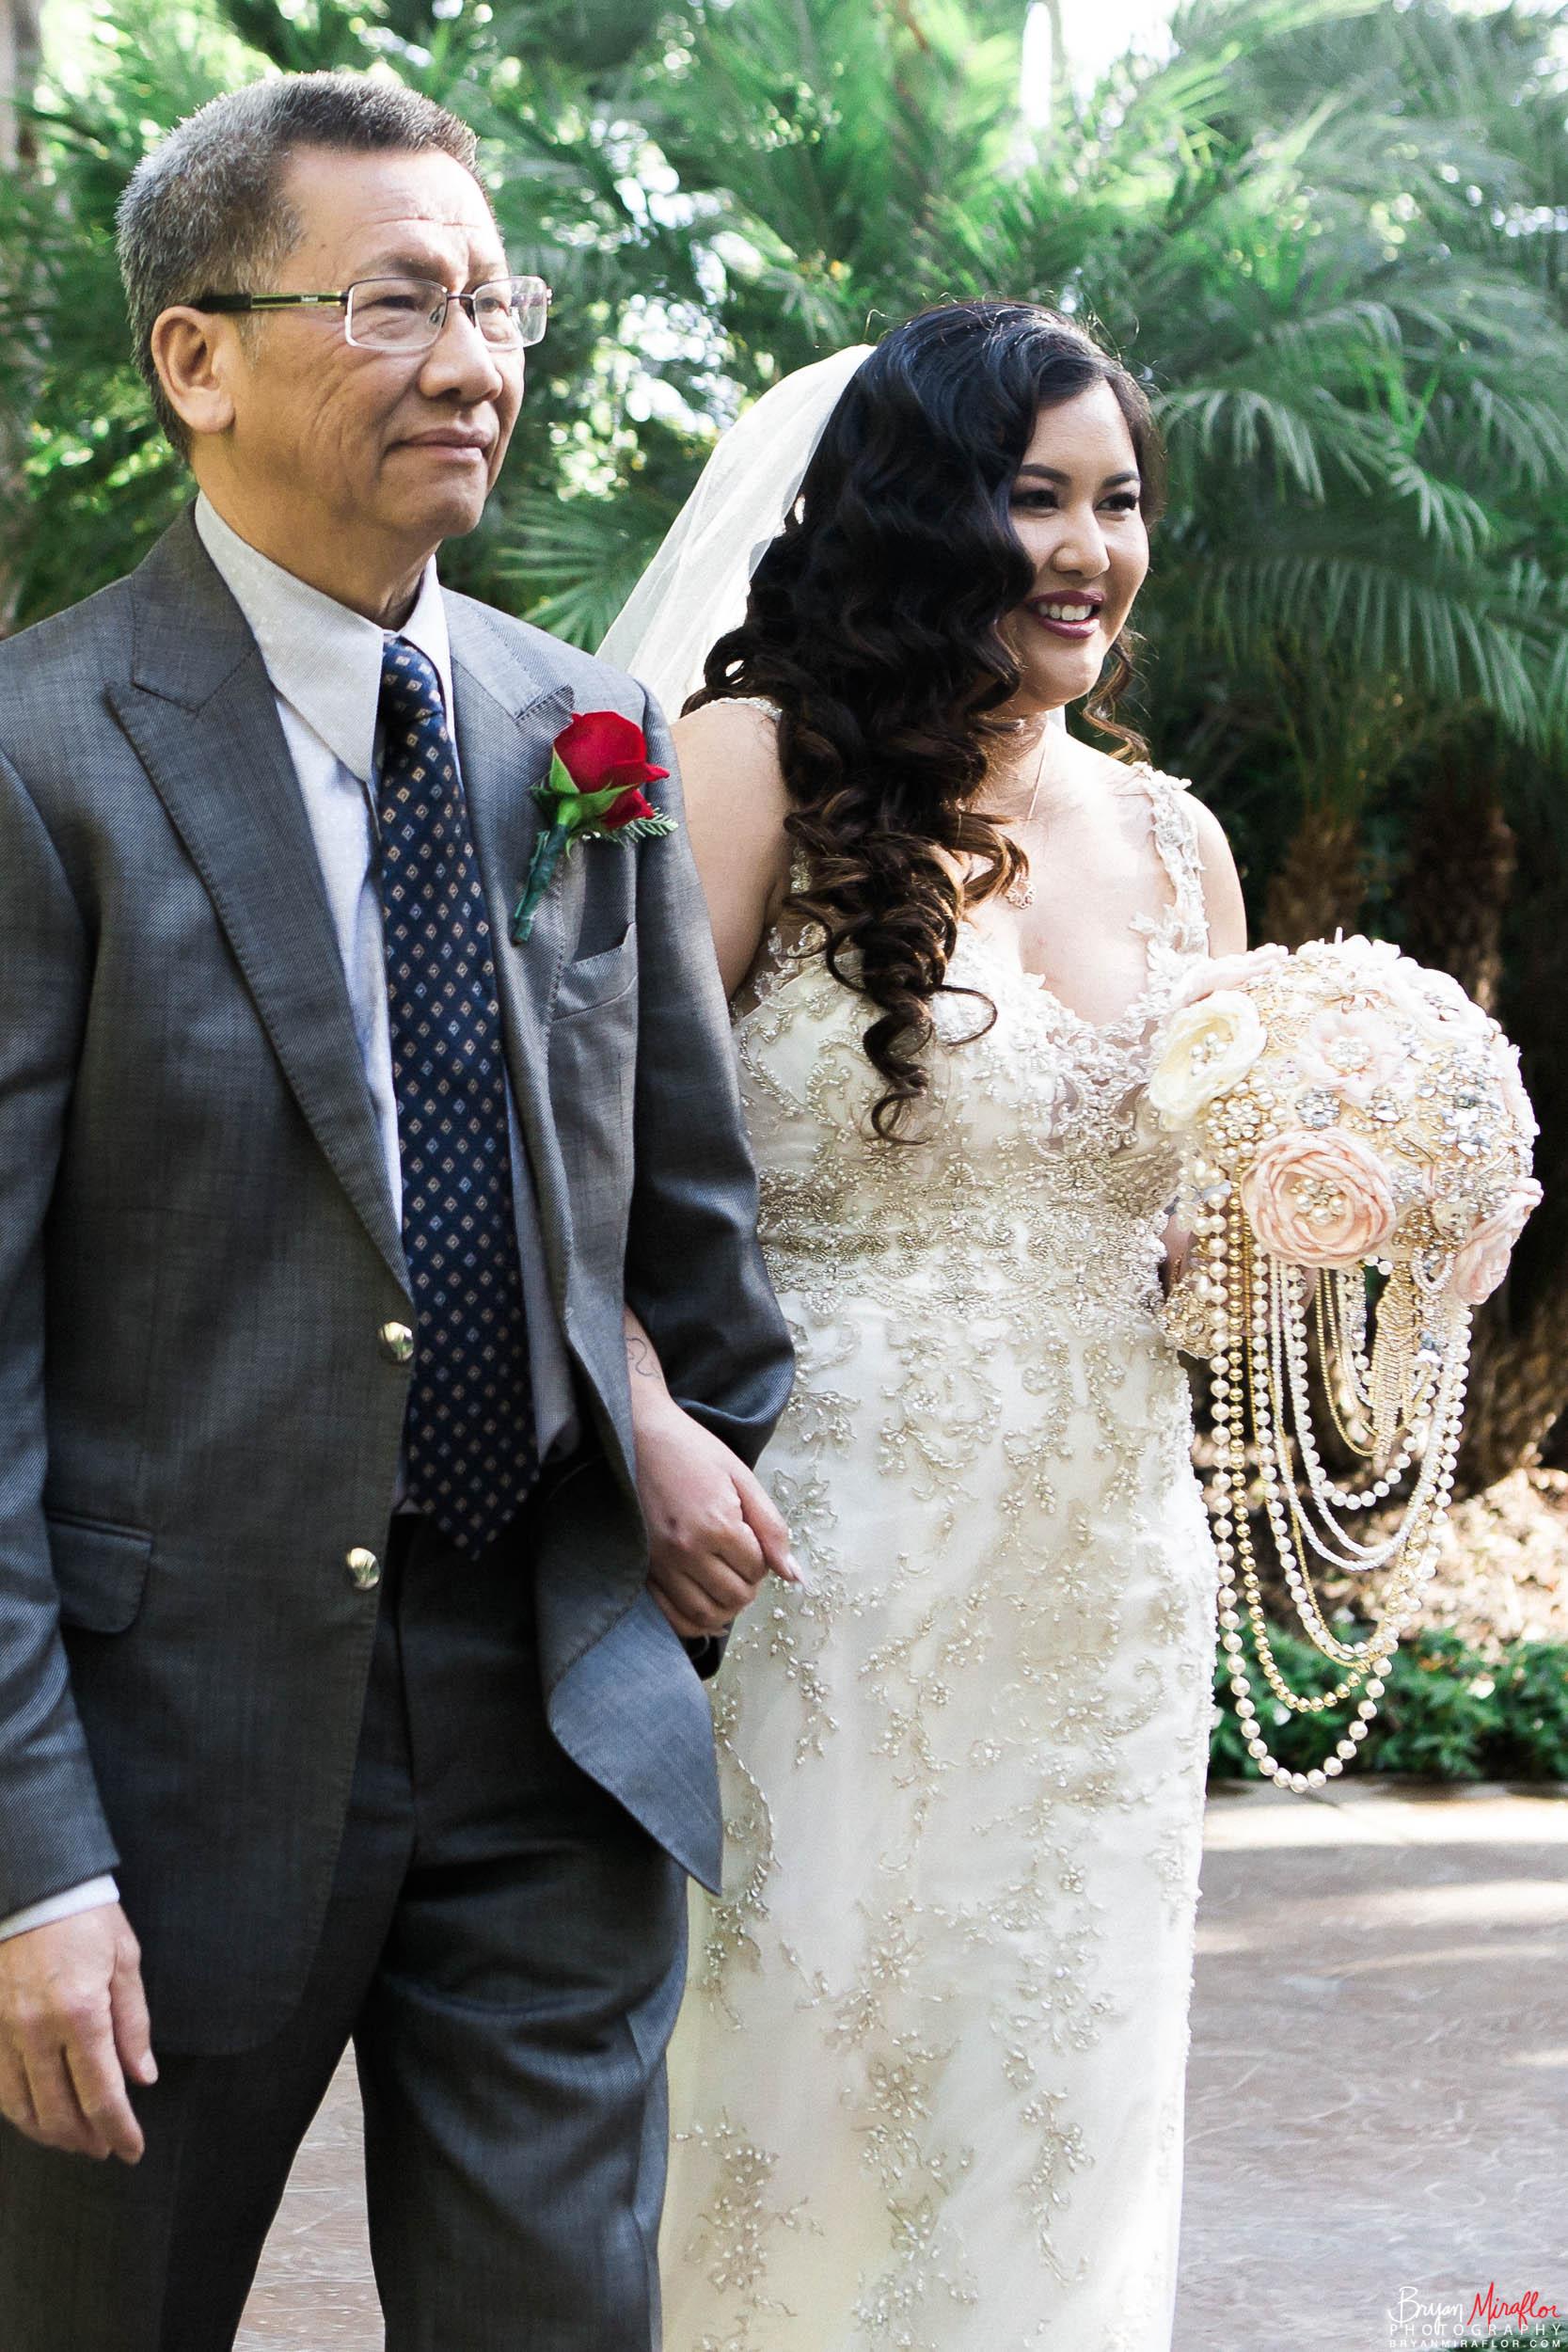 Bryan-Miraflor-Photography-Hannah-Jonathan-Married-Grand-Traditions-Estate-Gardens-Fallbrook-20171222-089.jpg